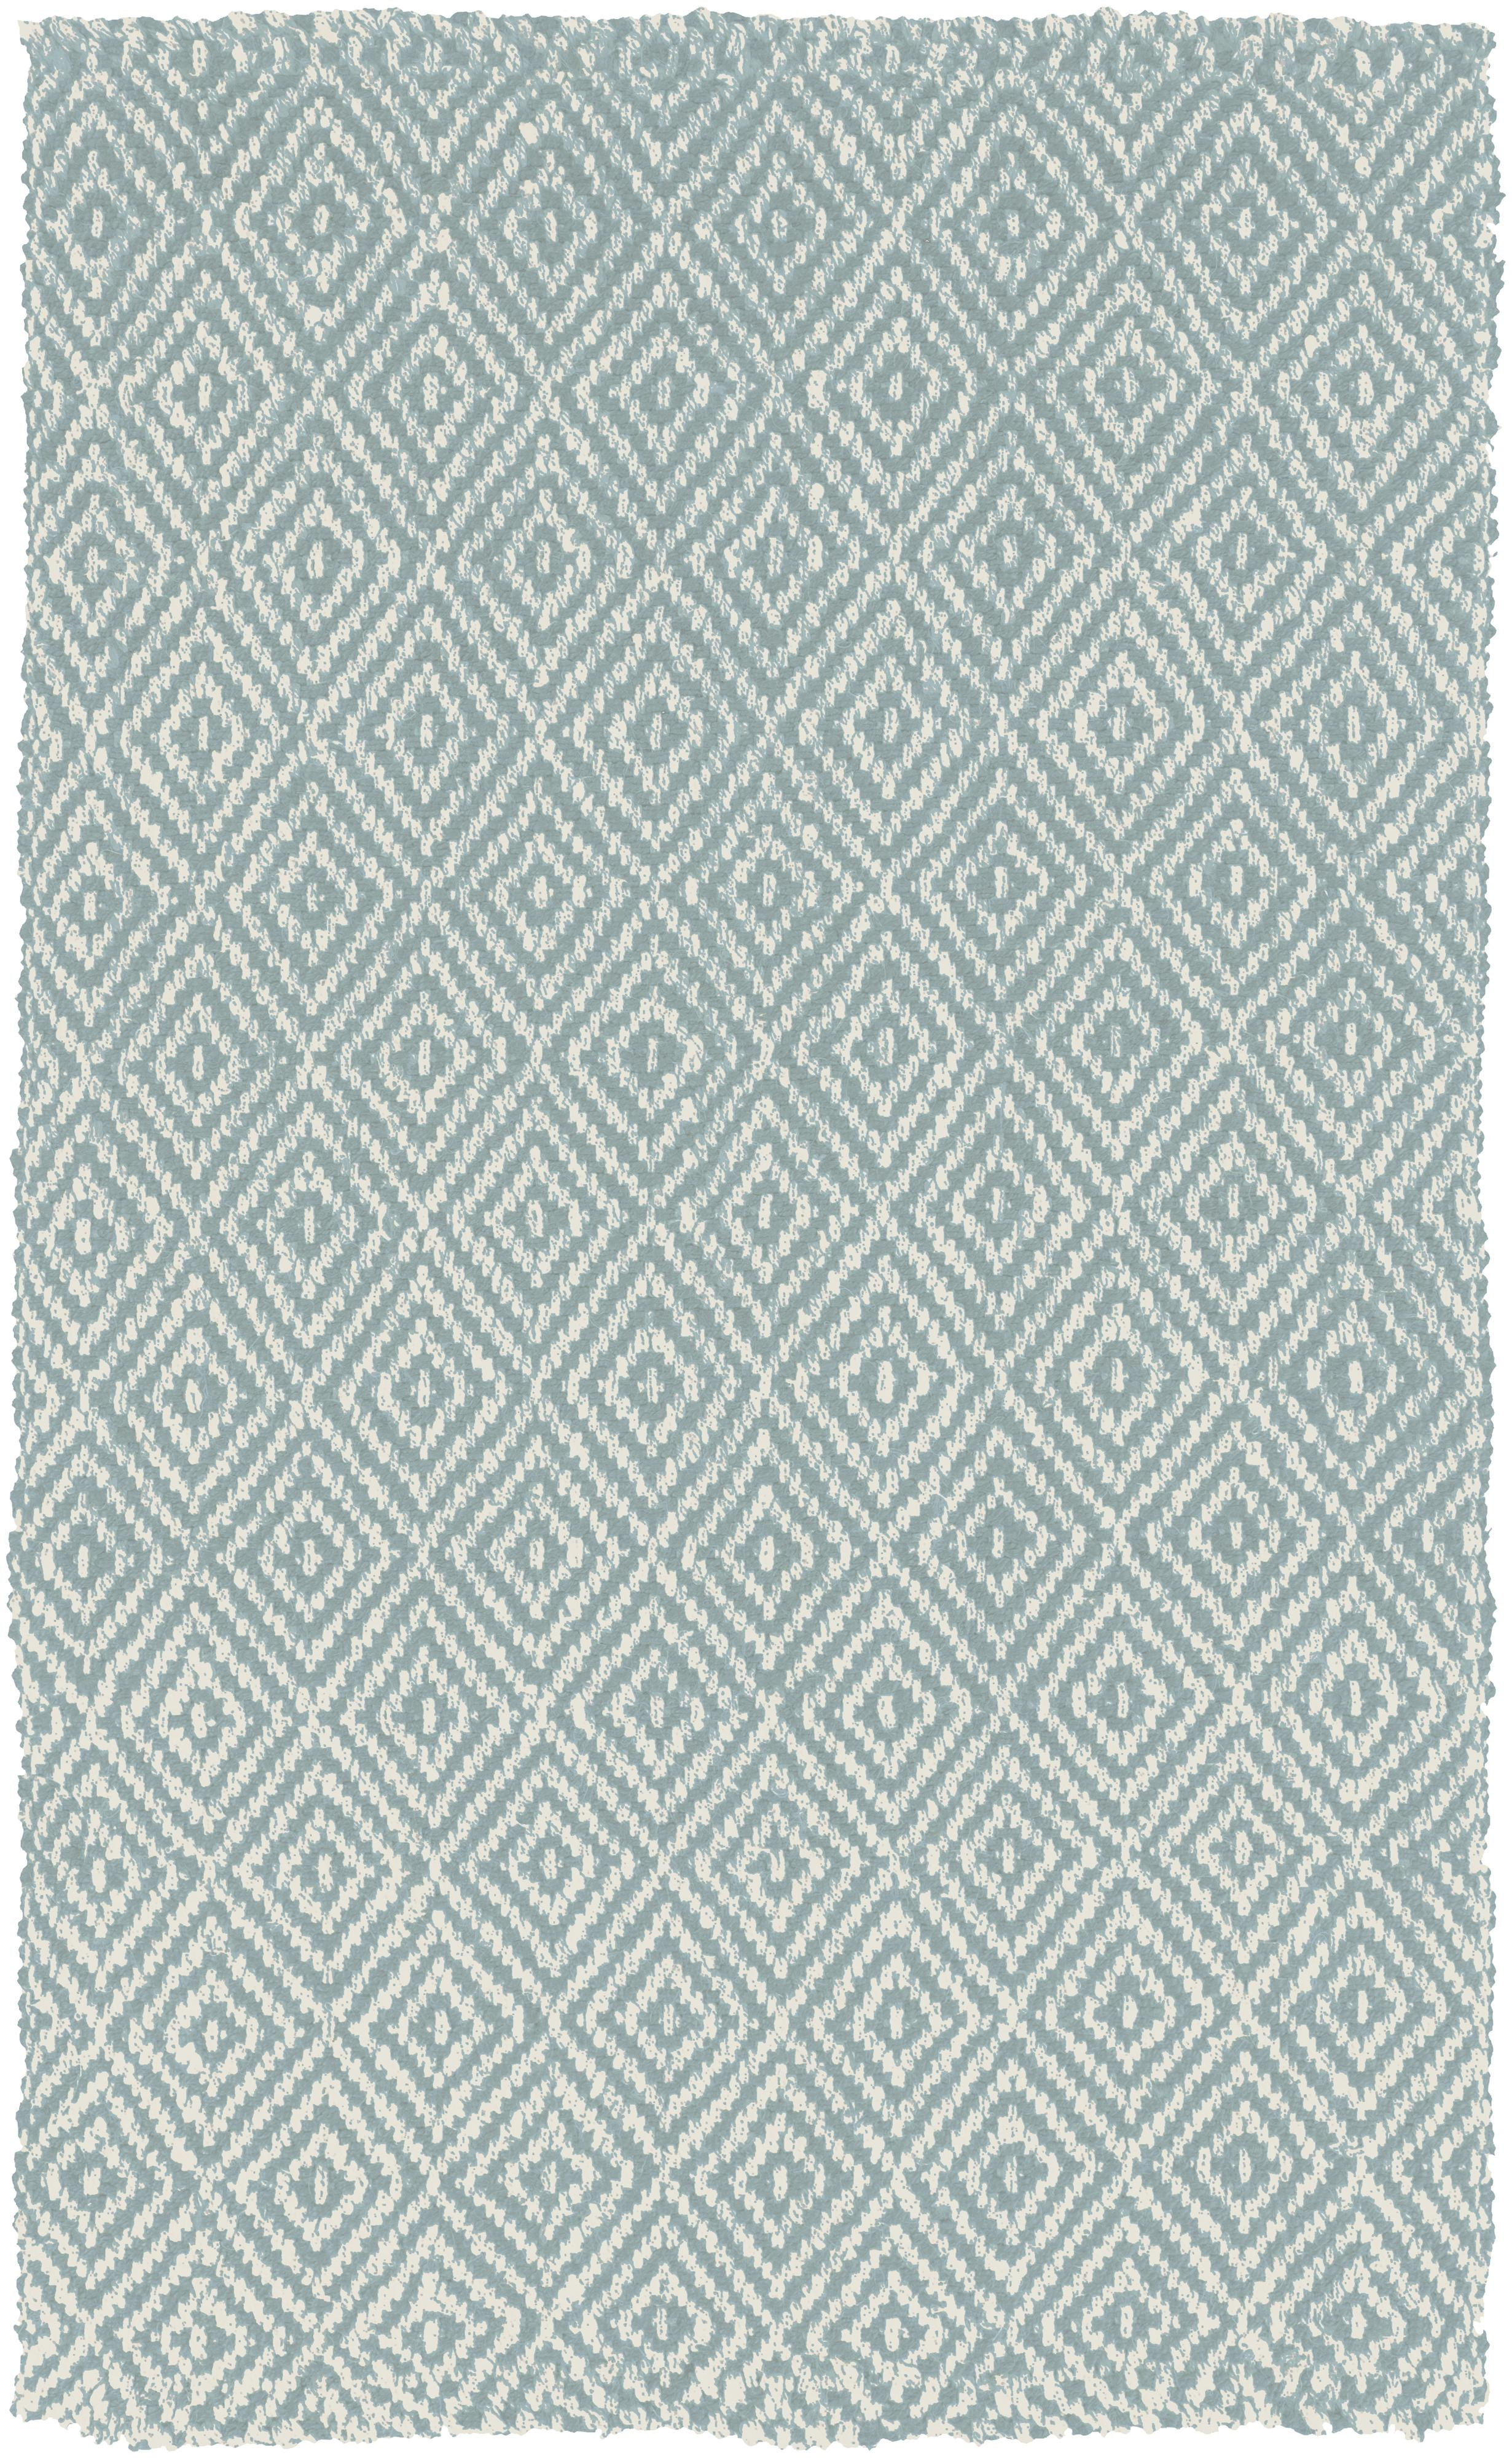 Surya Reeds 5' x 8' - Item Number: REED809-58